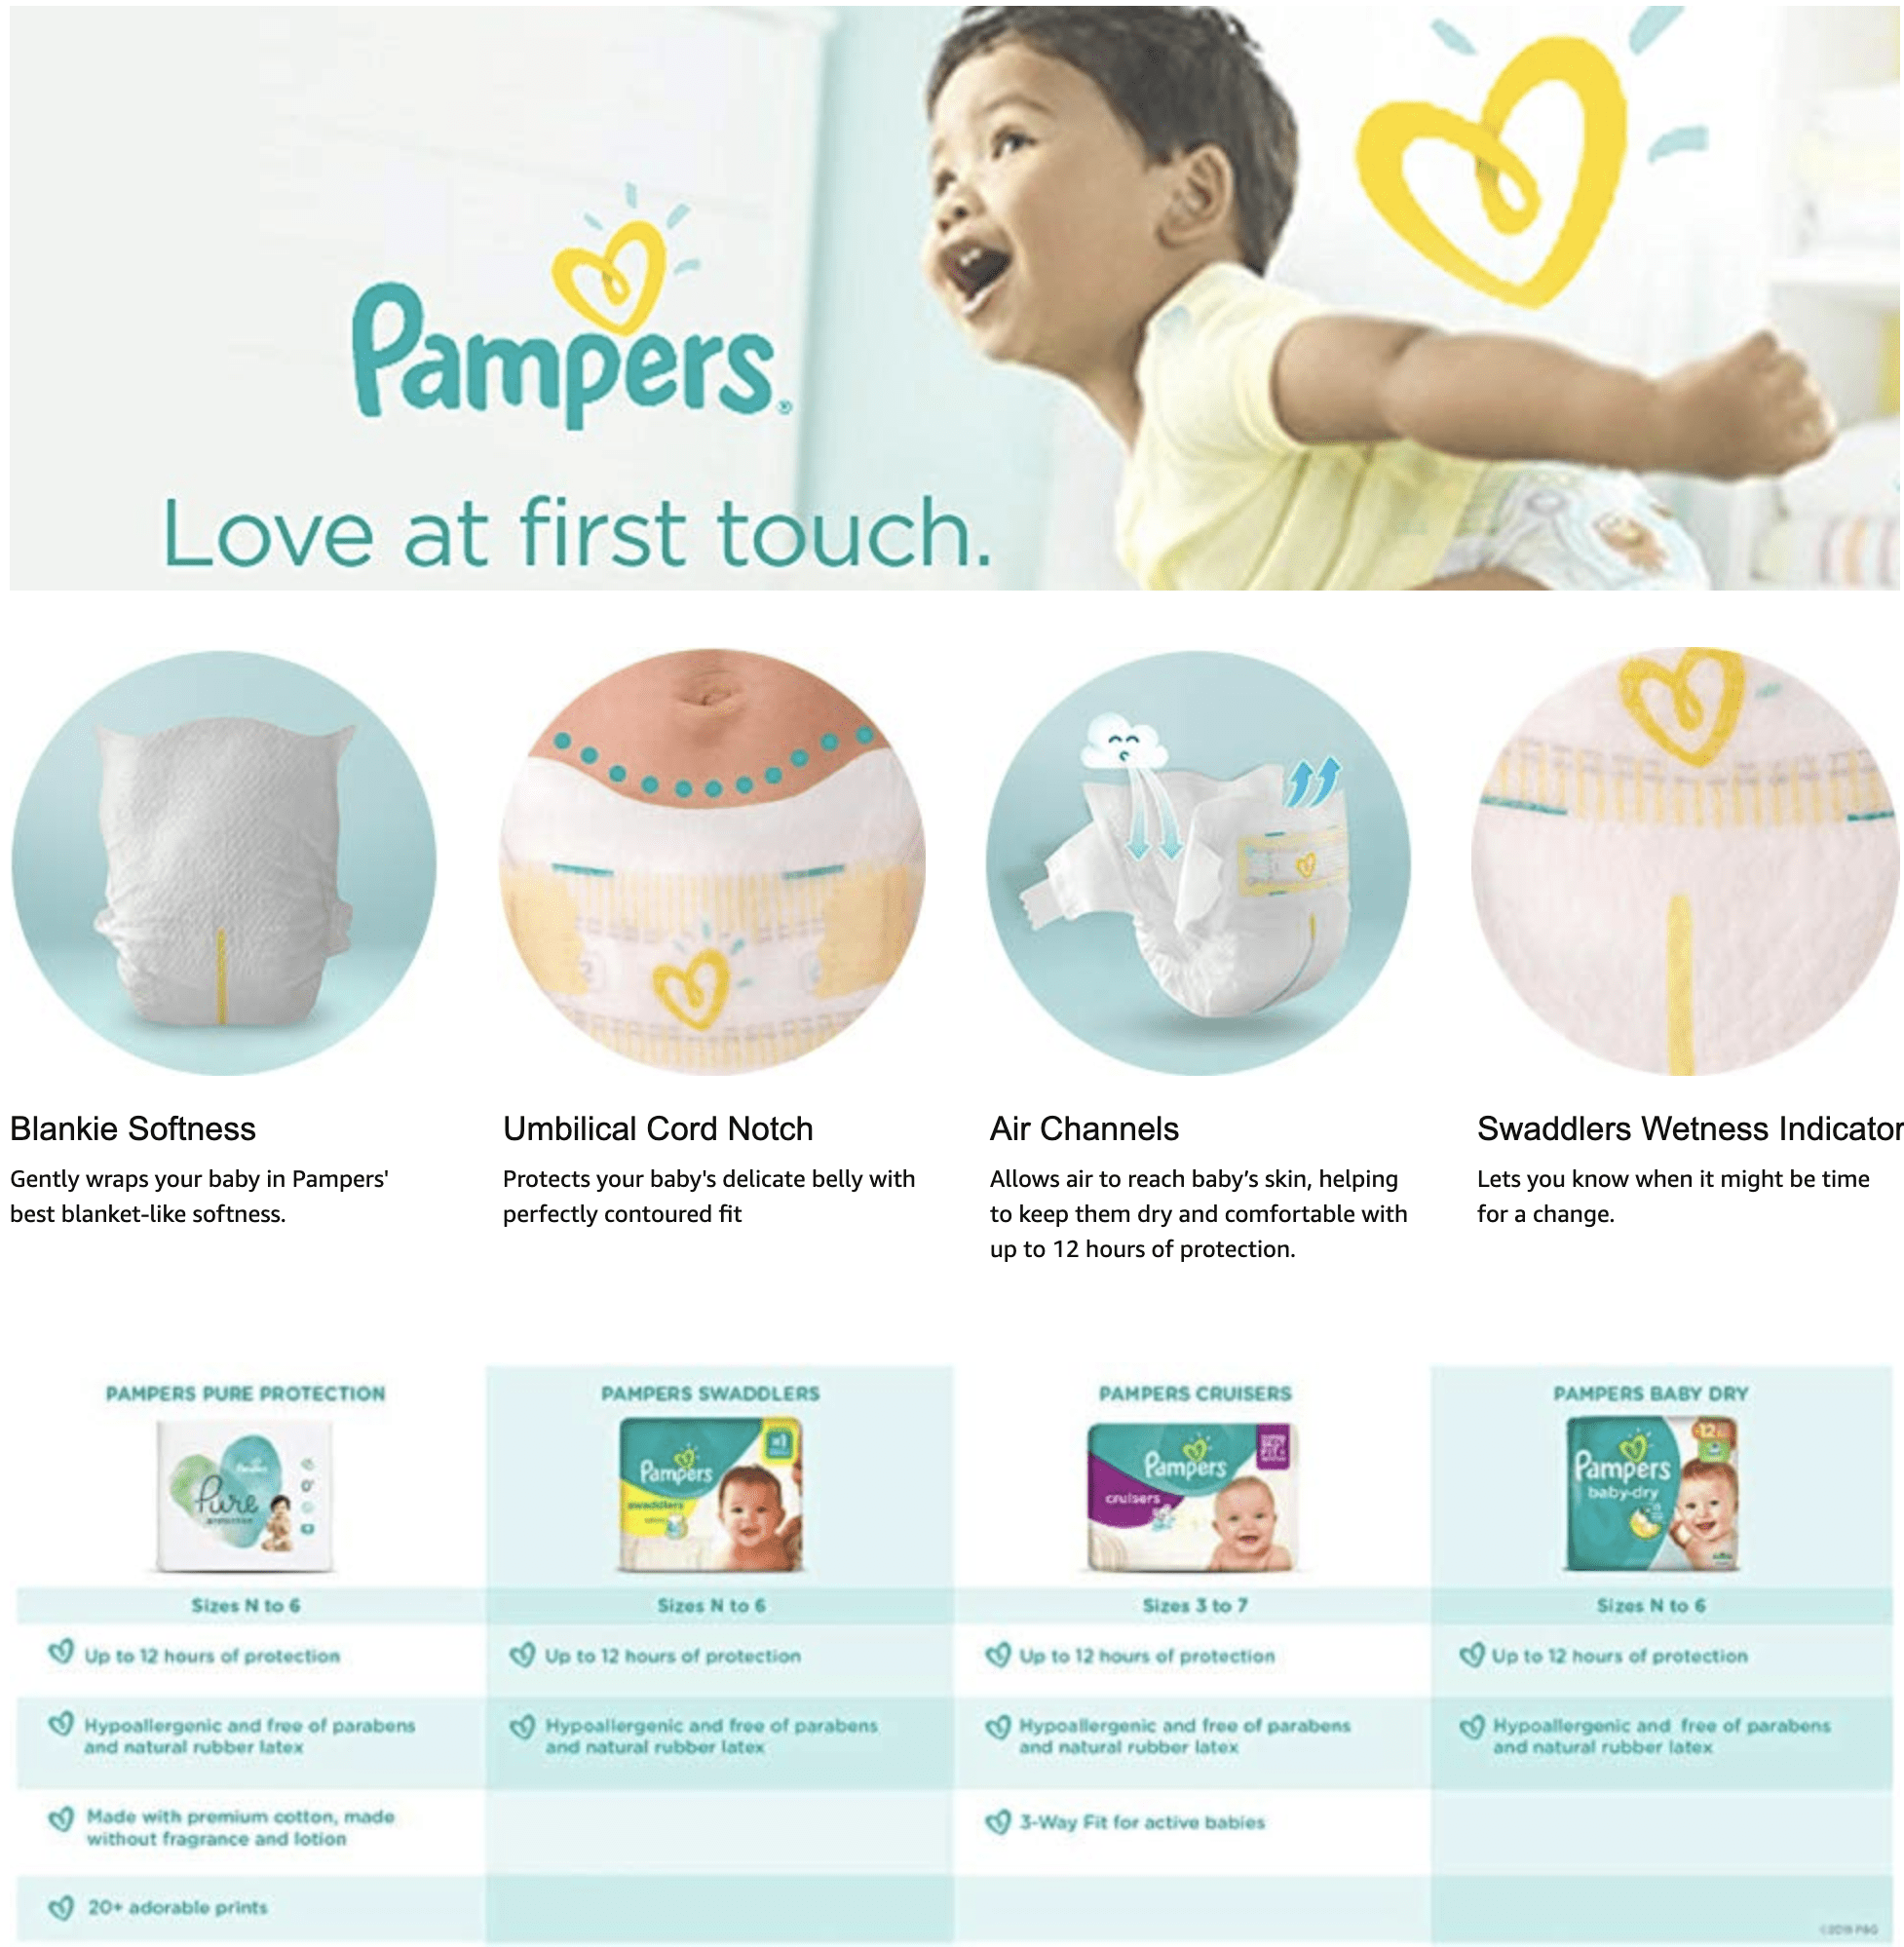 pampers saddlers benefits